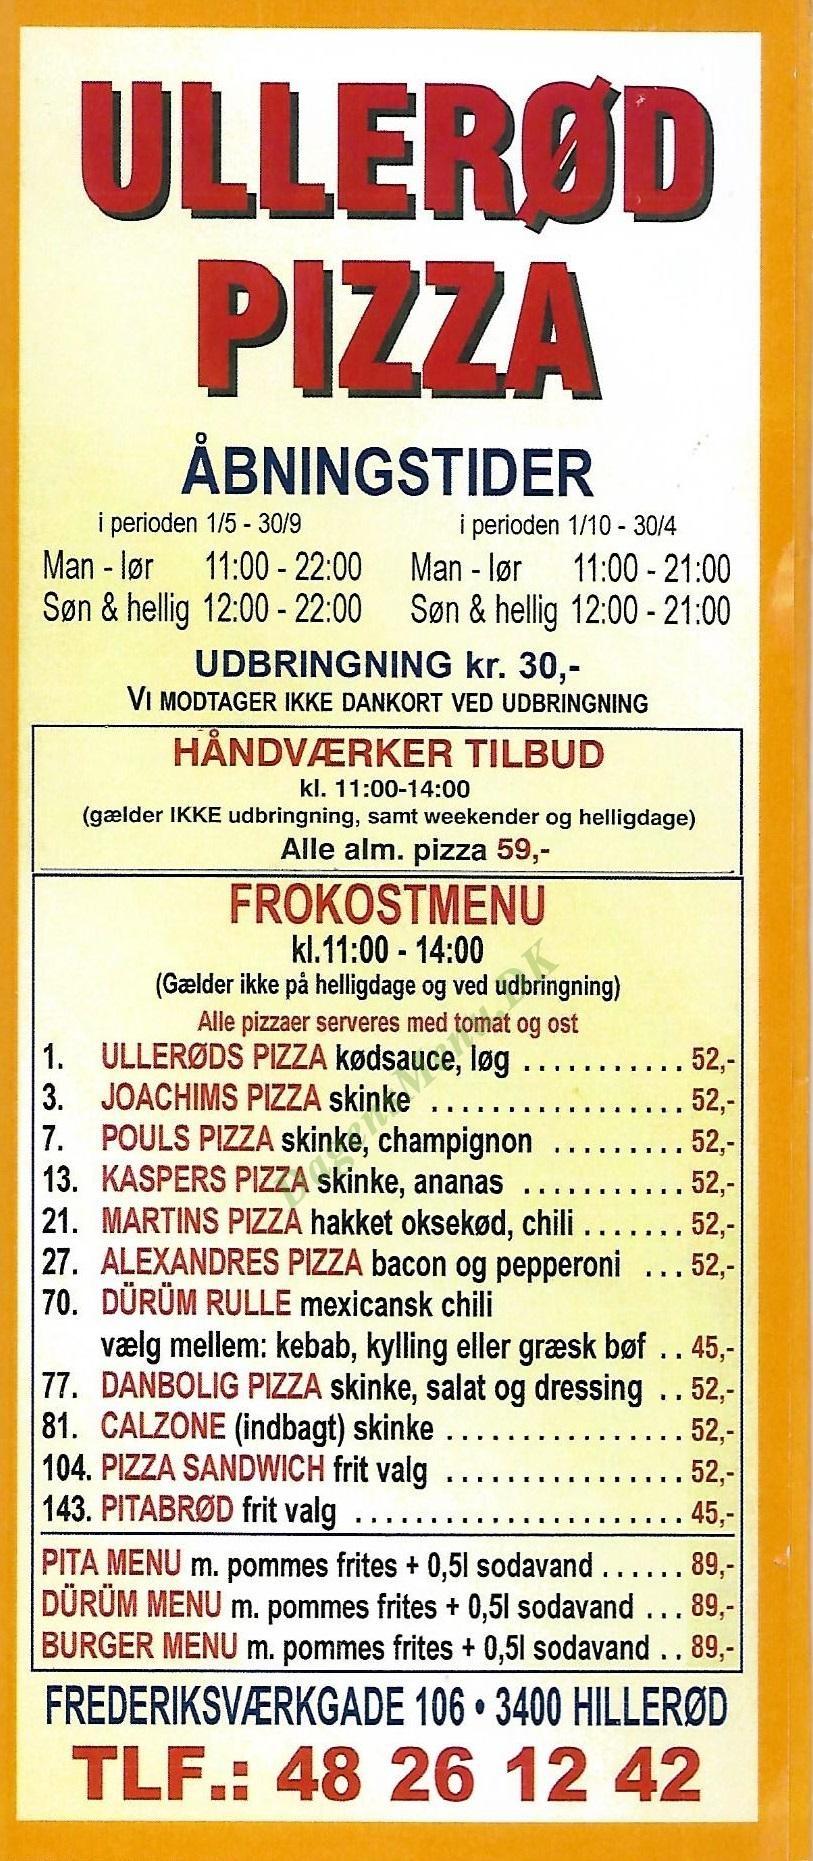 Ullerød Pizza - Menukort